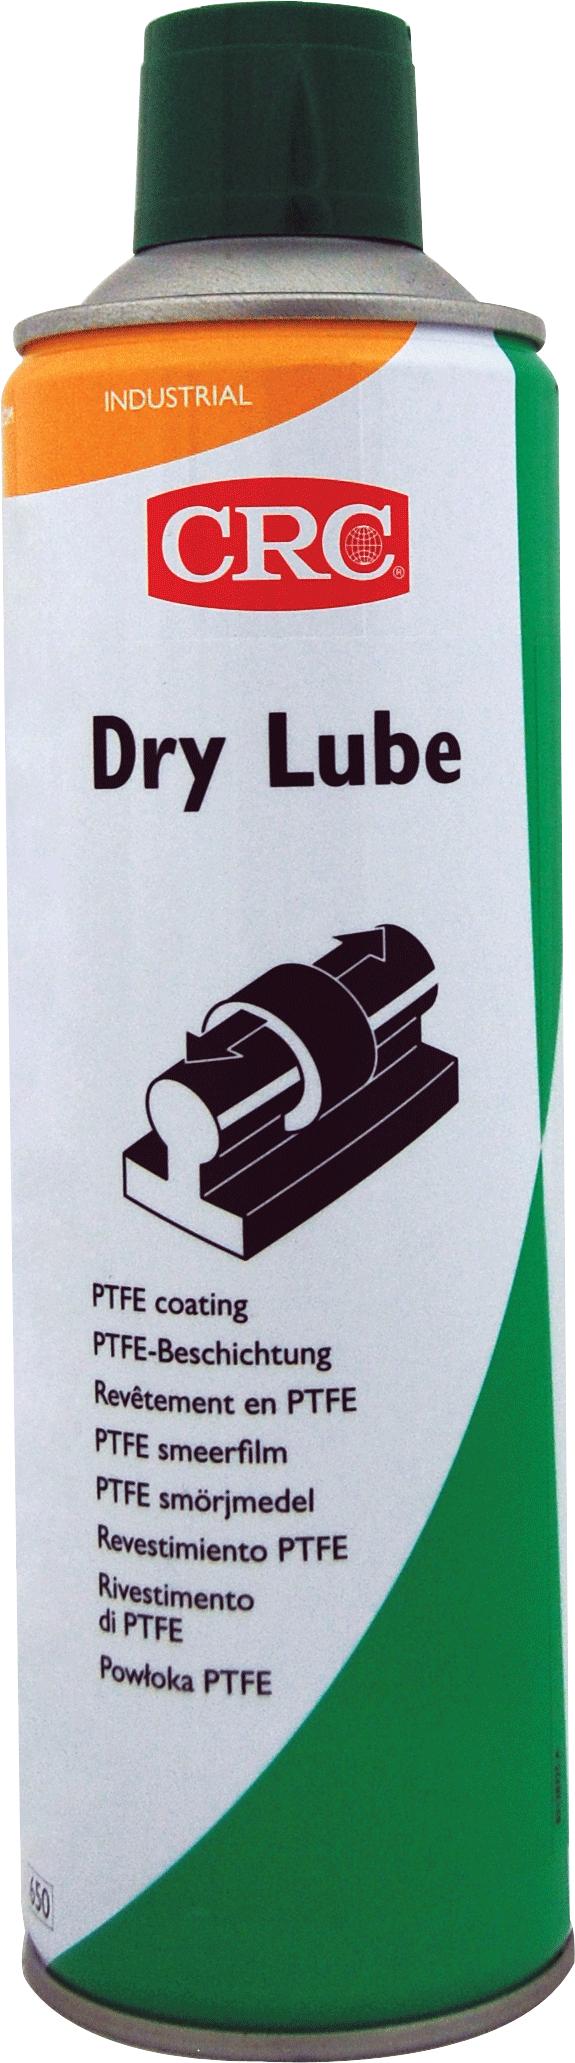 Afbeelding van crc industry dry lube 400 ml, spuitbus